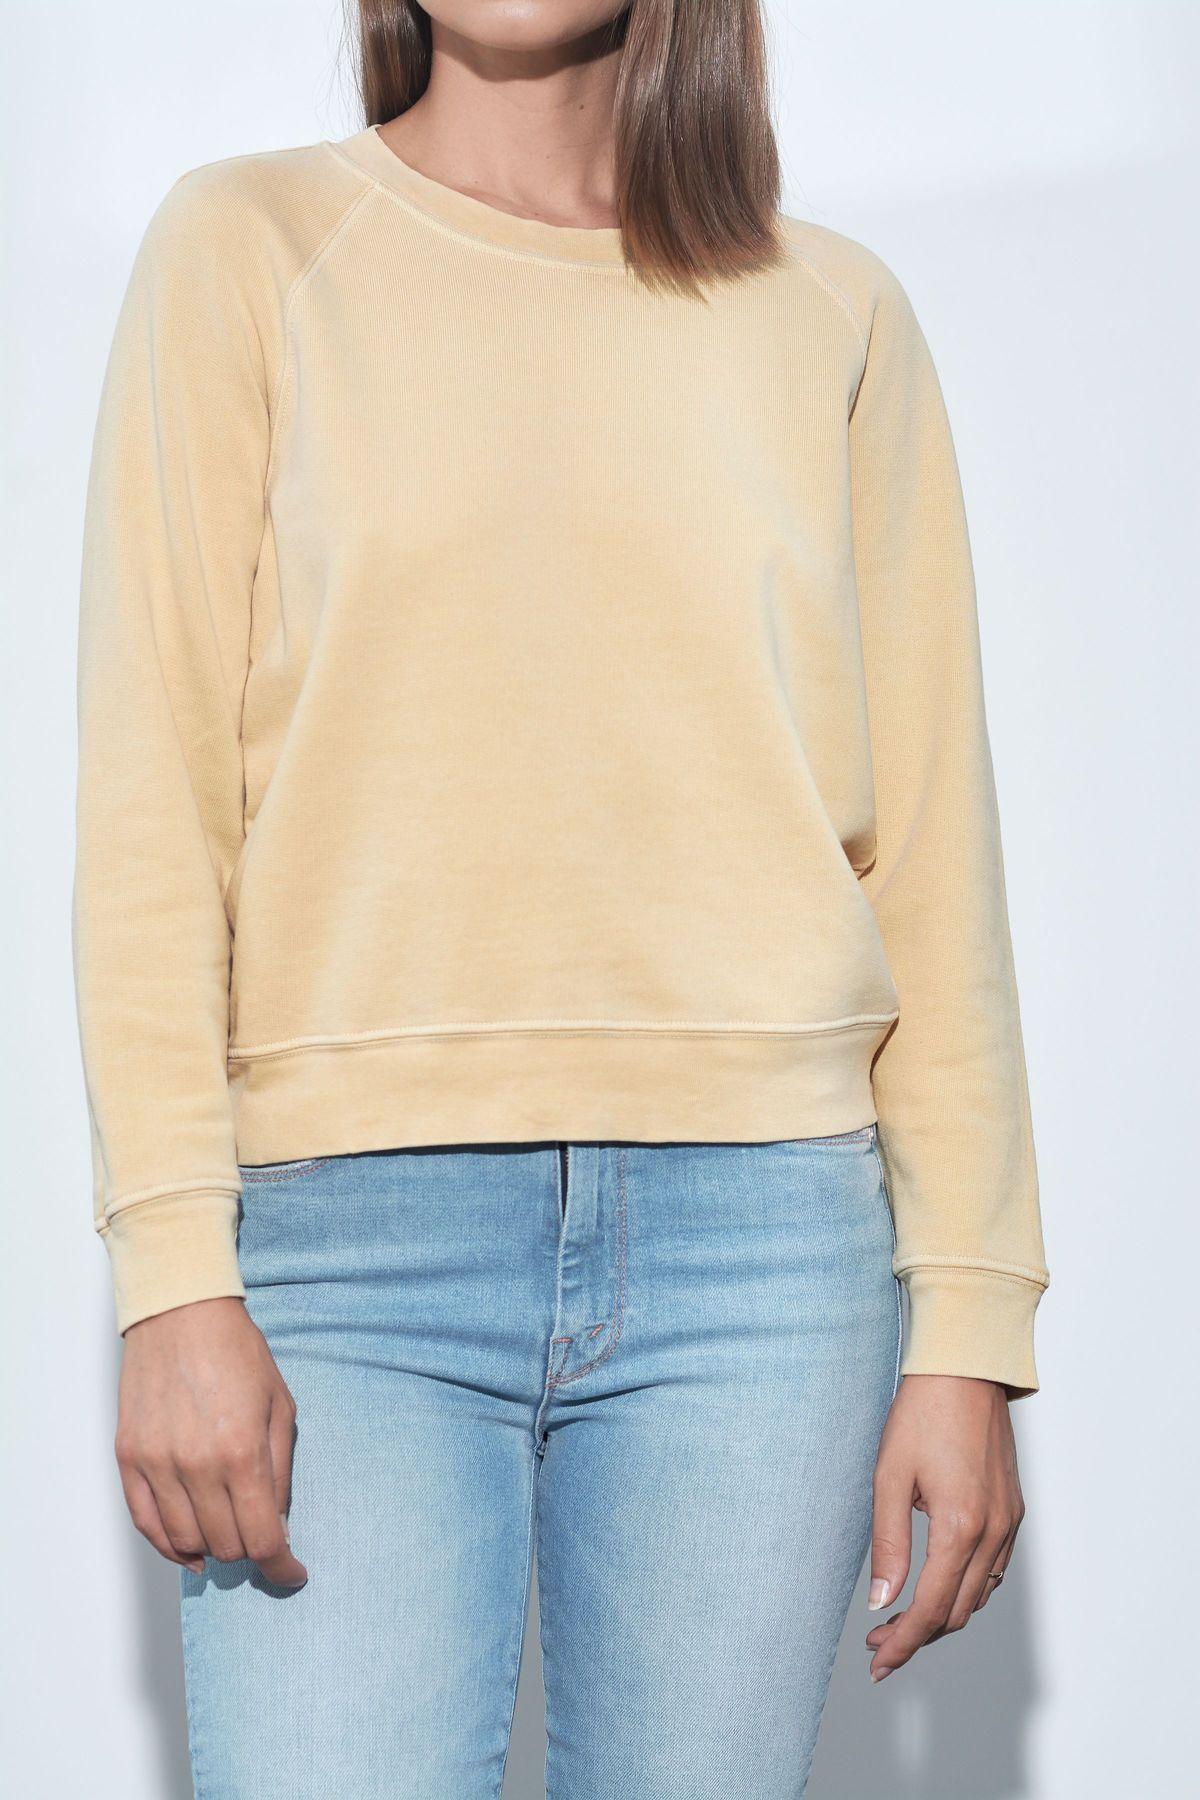 Stateside French Terry Raglan Sweatshirt - Daisy